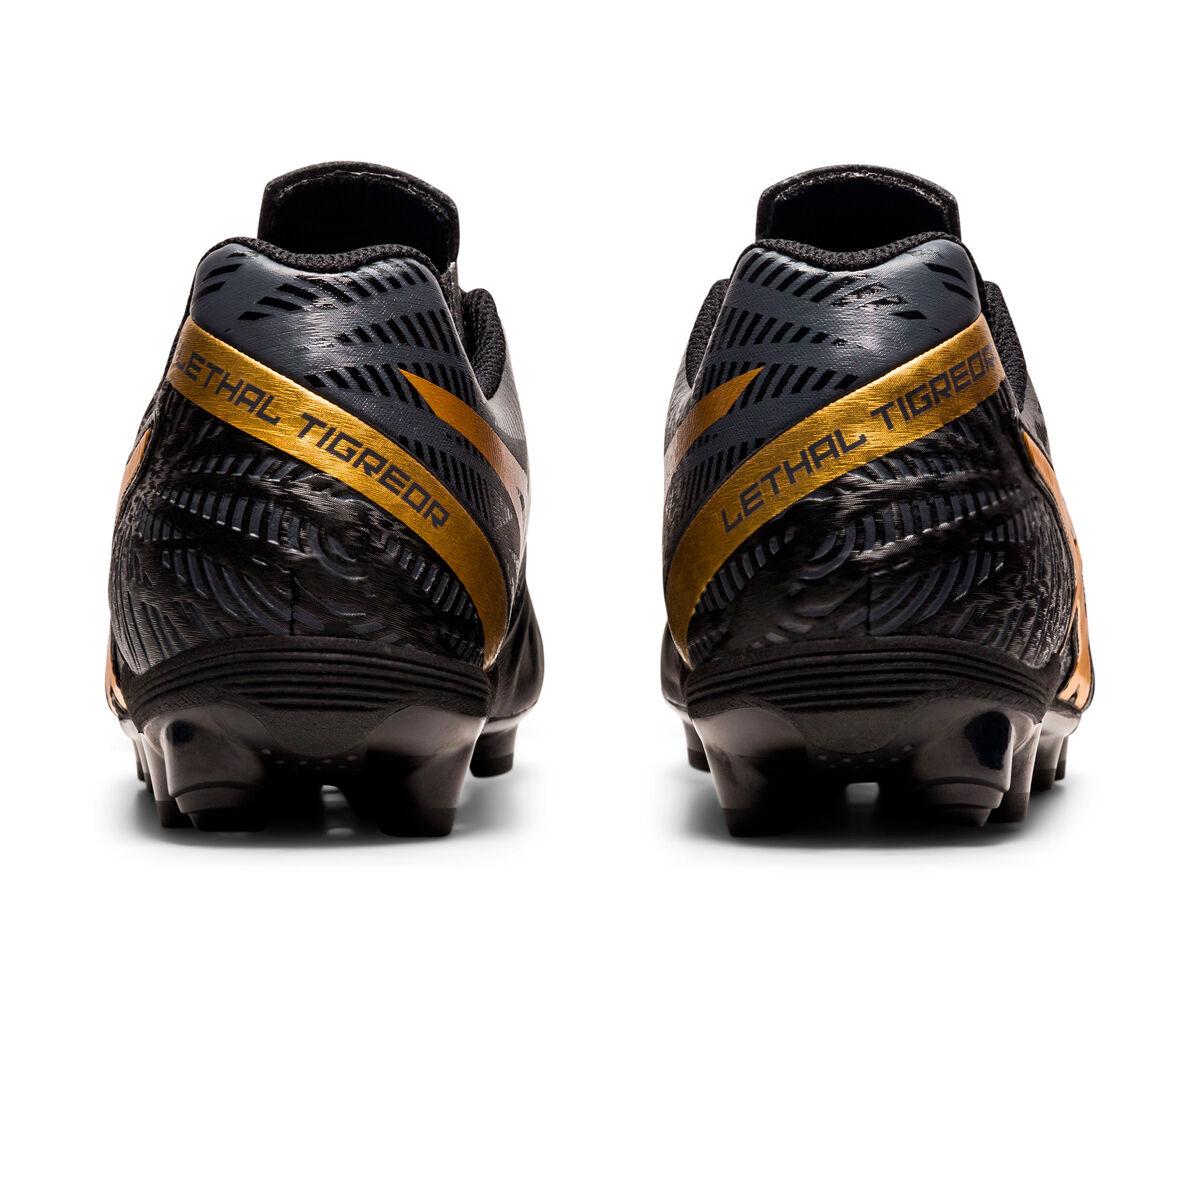 adidas yeezy blue tints black paint green eyes | Asics Lethal Tigreor IT FF 2 Kids Football Boots